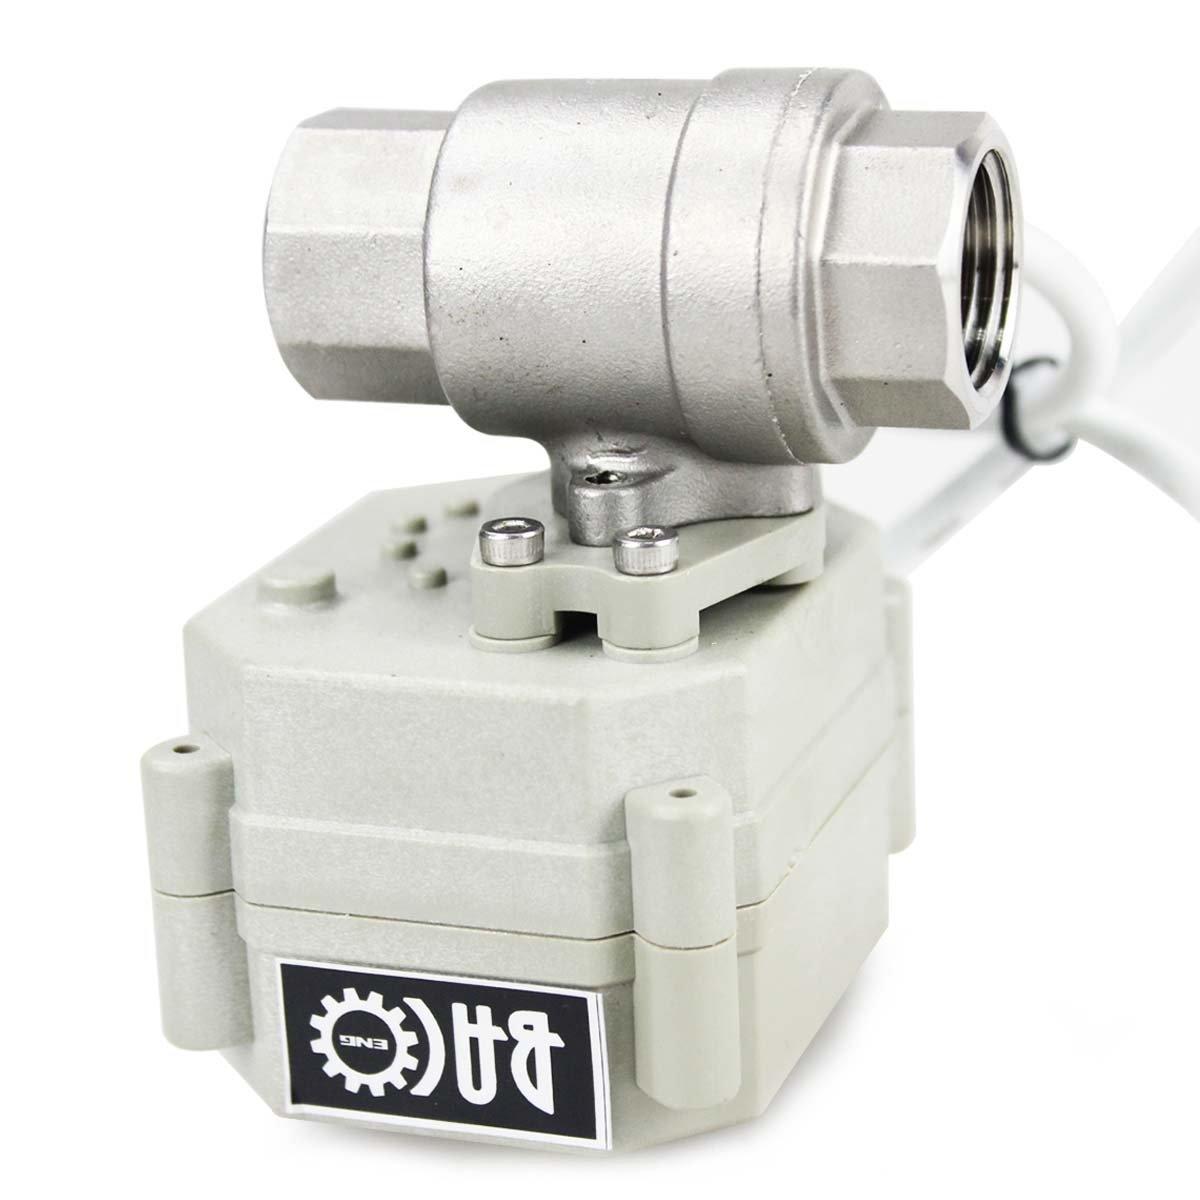 BACOENG AC110-230V 3 Wege 1 Messing Motorkugelhahn Zonenventil CR202C 2 Dr/ähte Elektrische Kugelventil NC